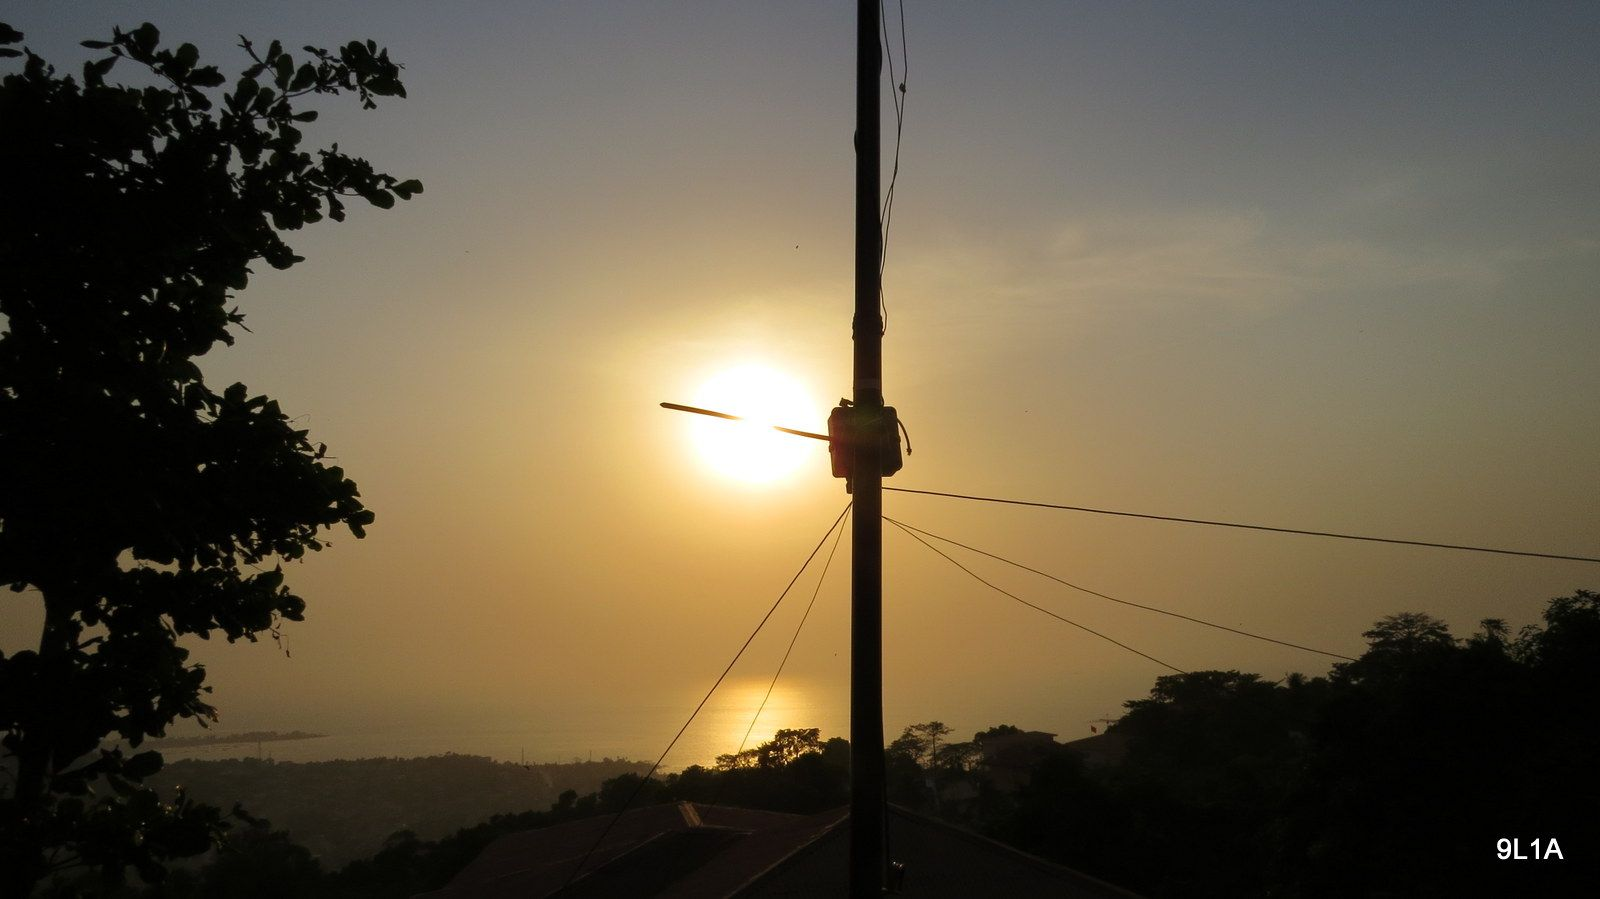 Sierra Leone 9L1A News Antenna 5